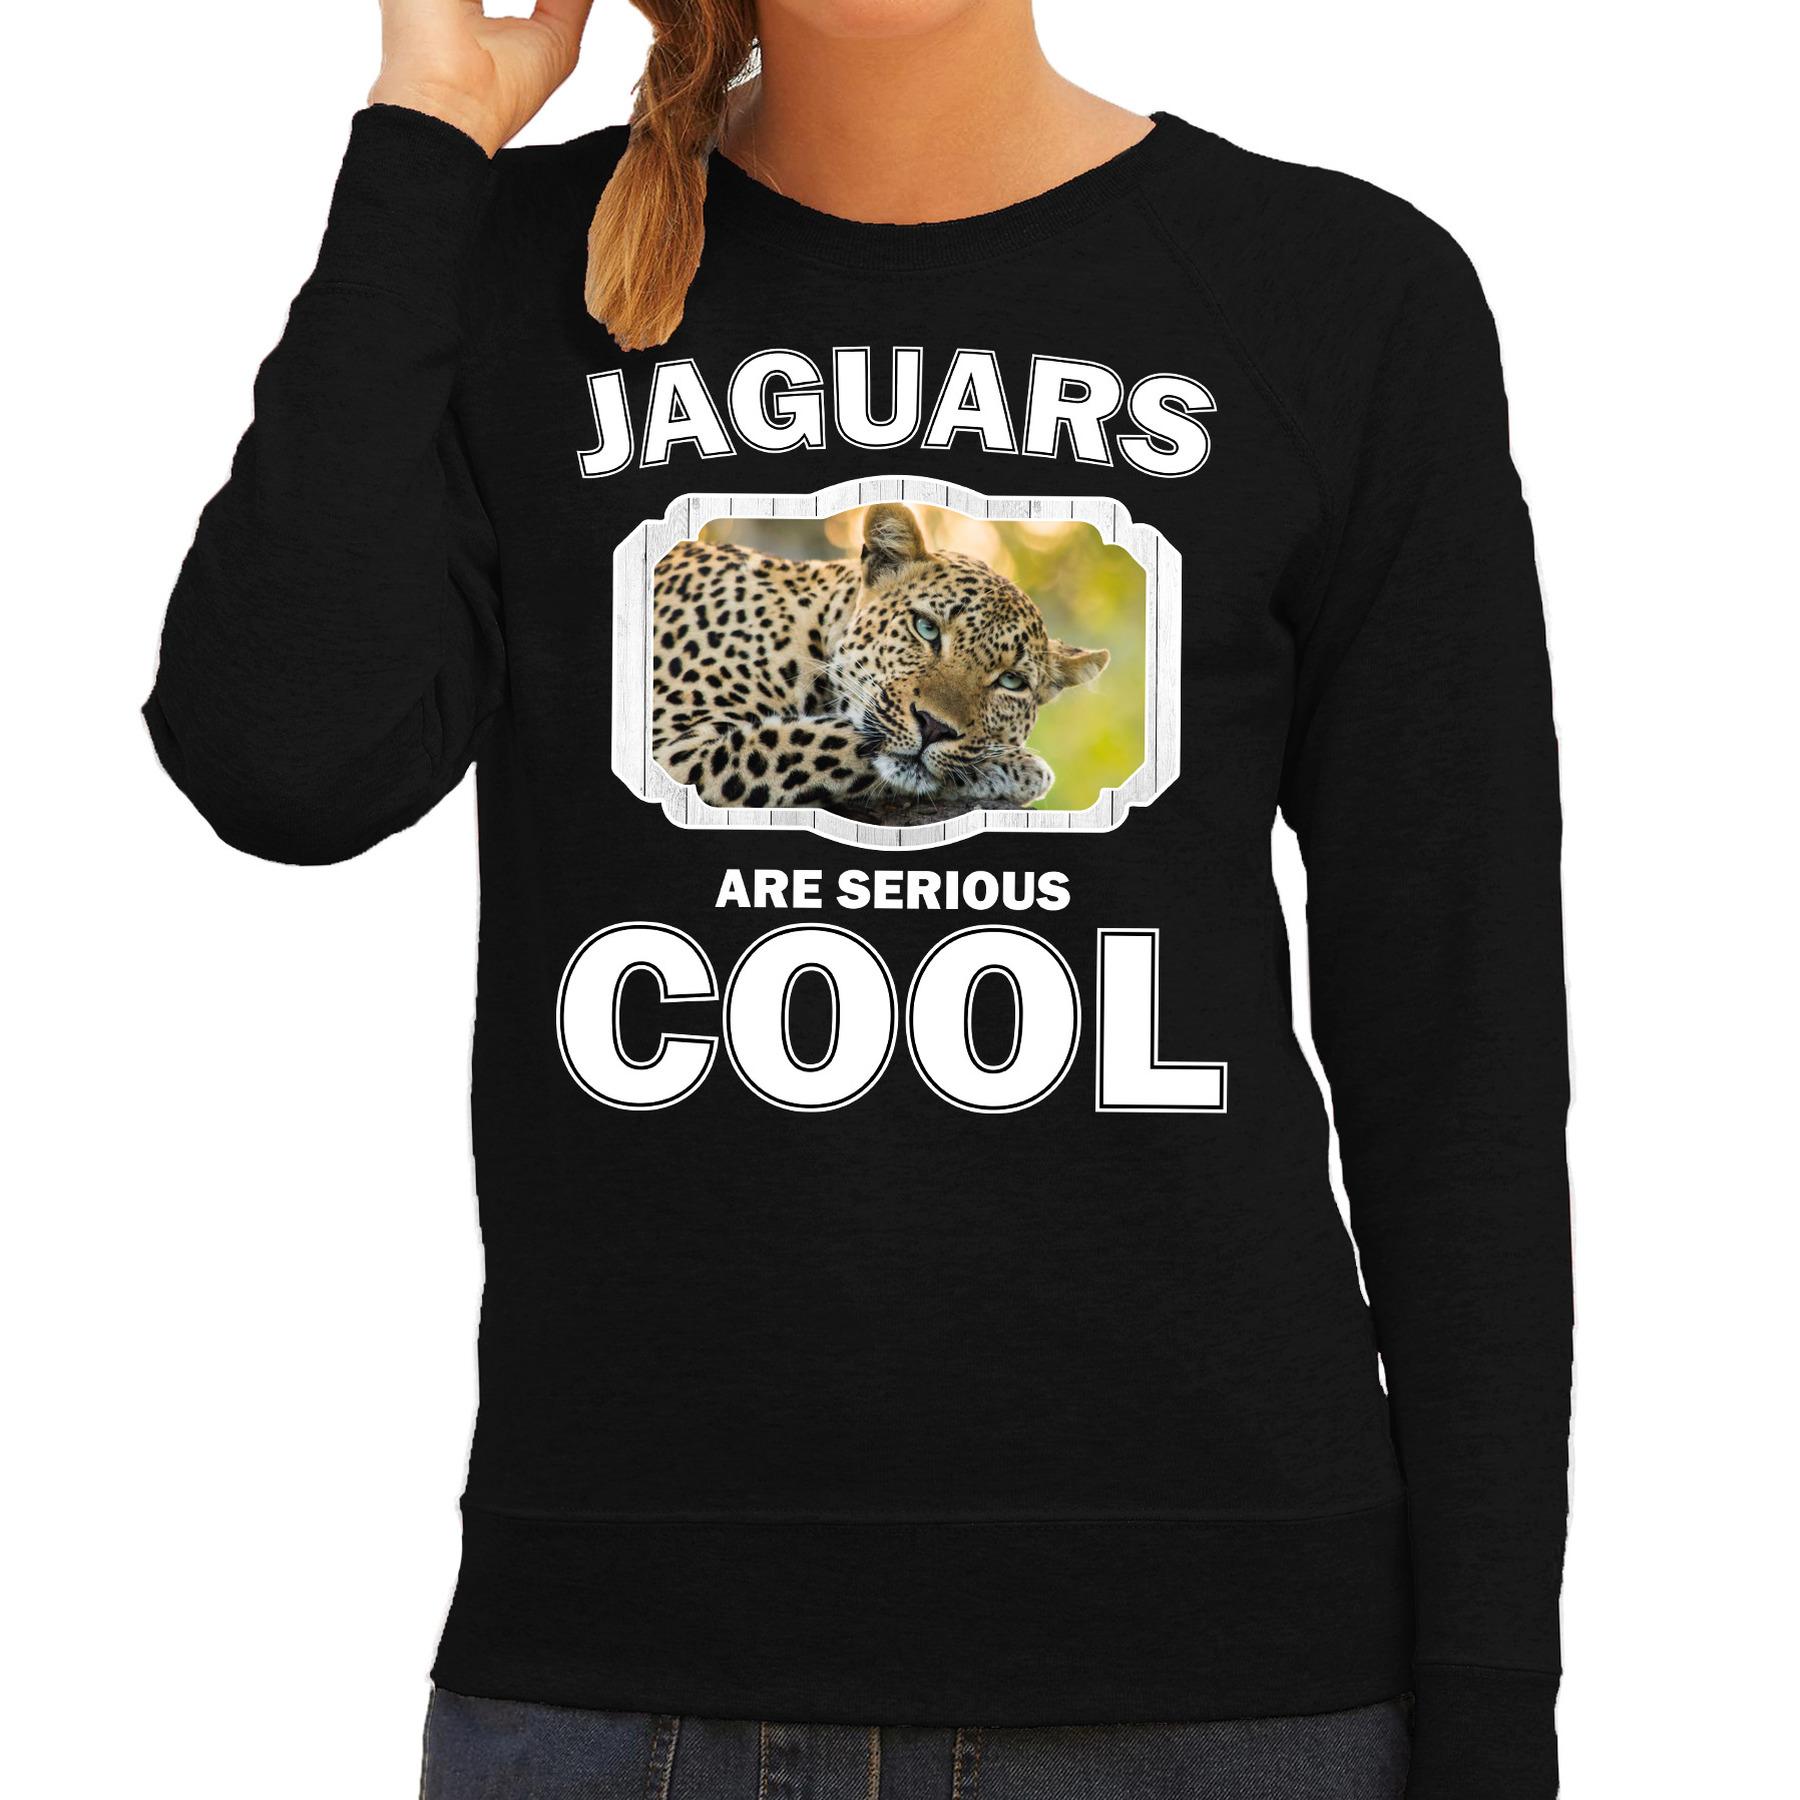 Sweater jaguars are serious cool zwart dames - jaguars/ luipaarden/ luipaard trui